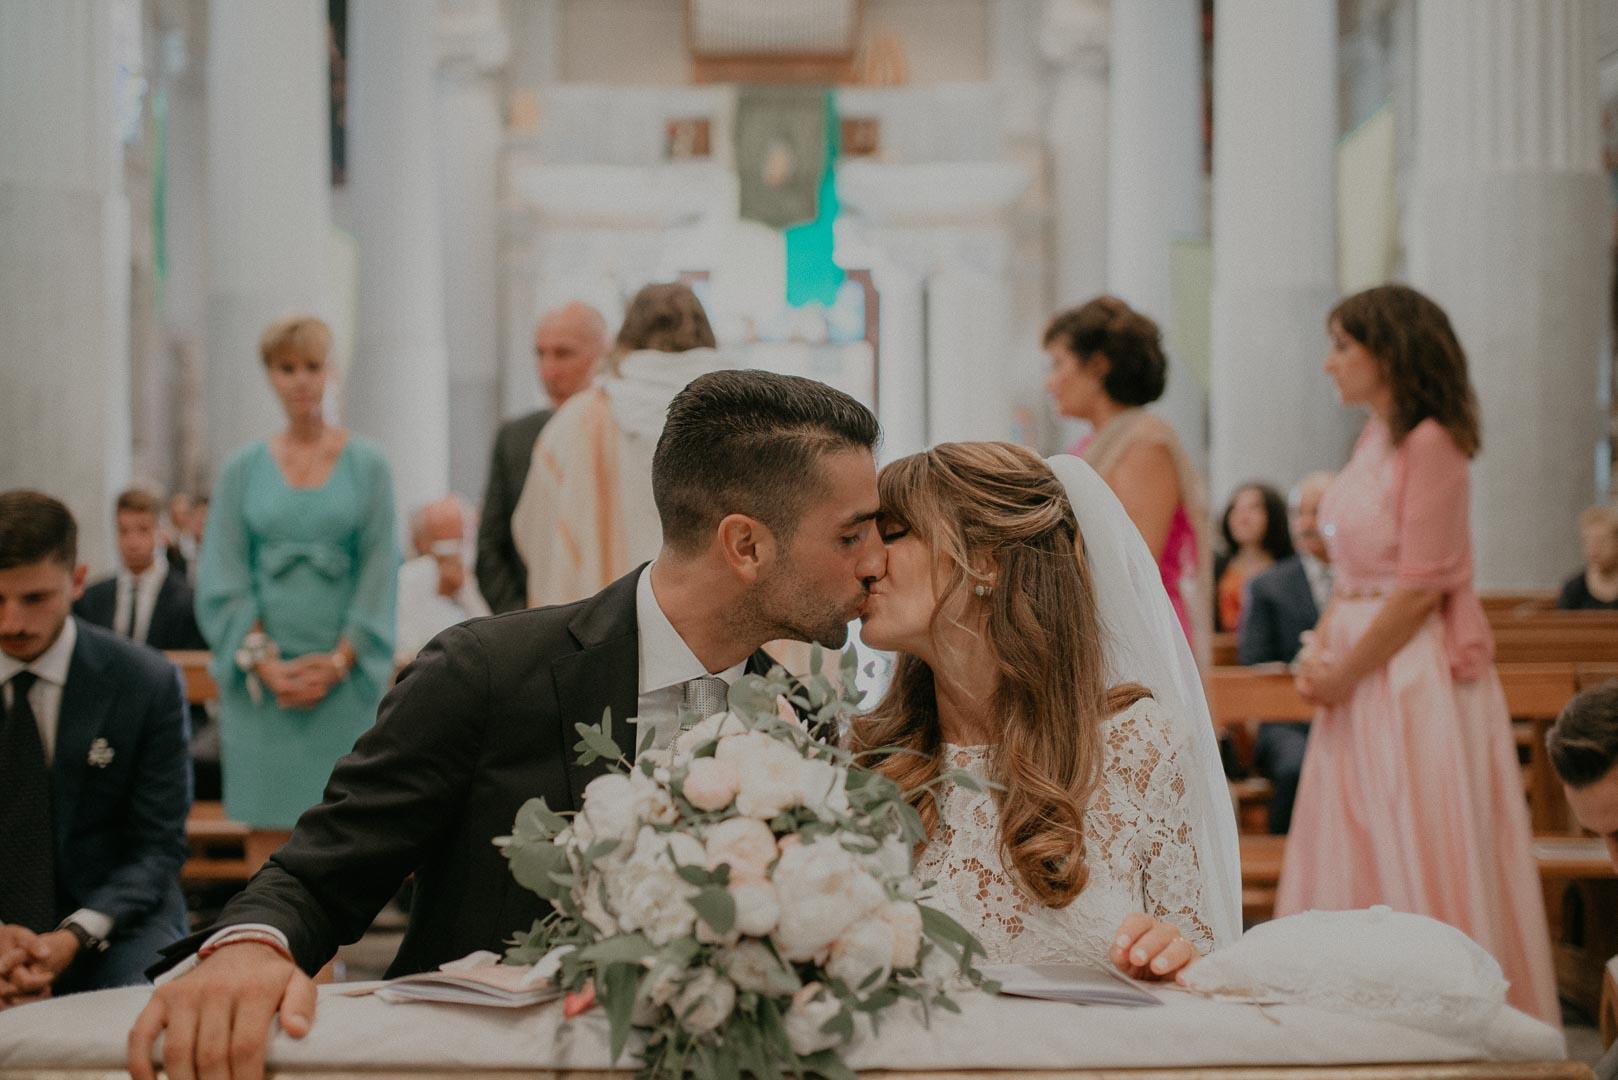 wedding-photographer-destination-fineart-bespoke-reportage-napoli-nabilah-vivianeizzo-spazio46-75